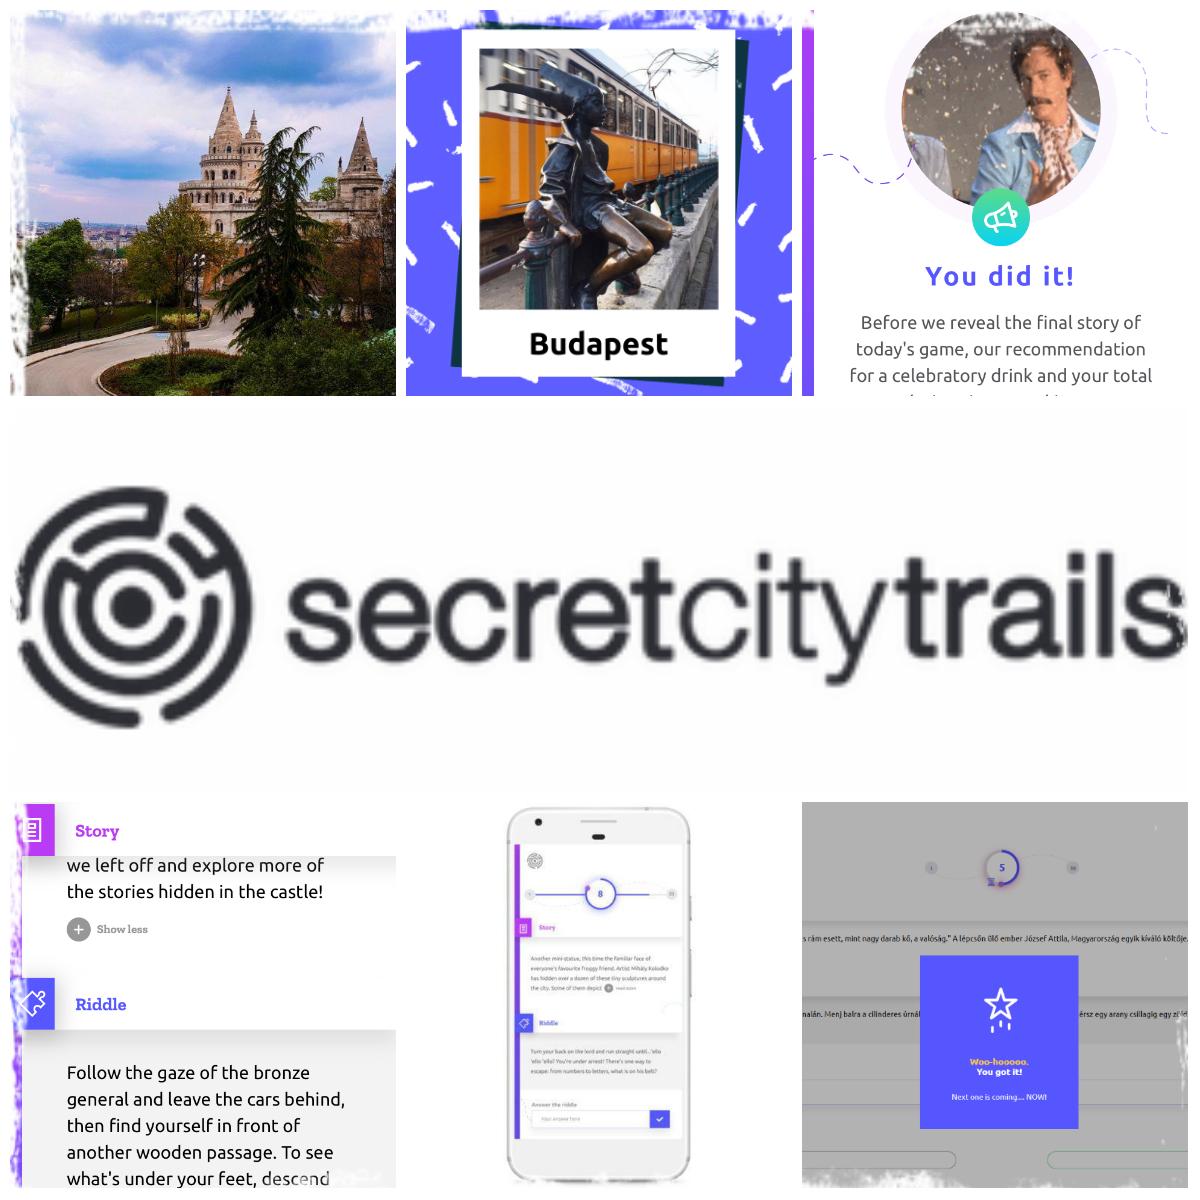 secretcitytrails.jpg